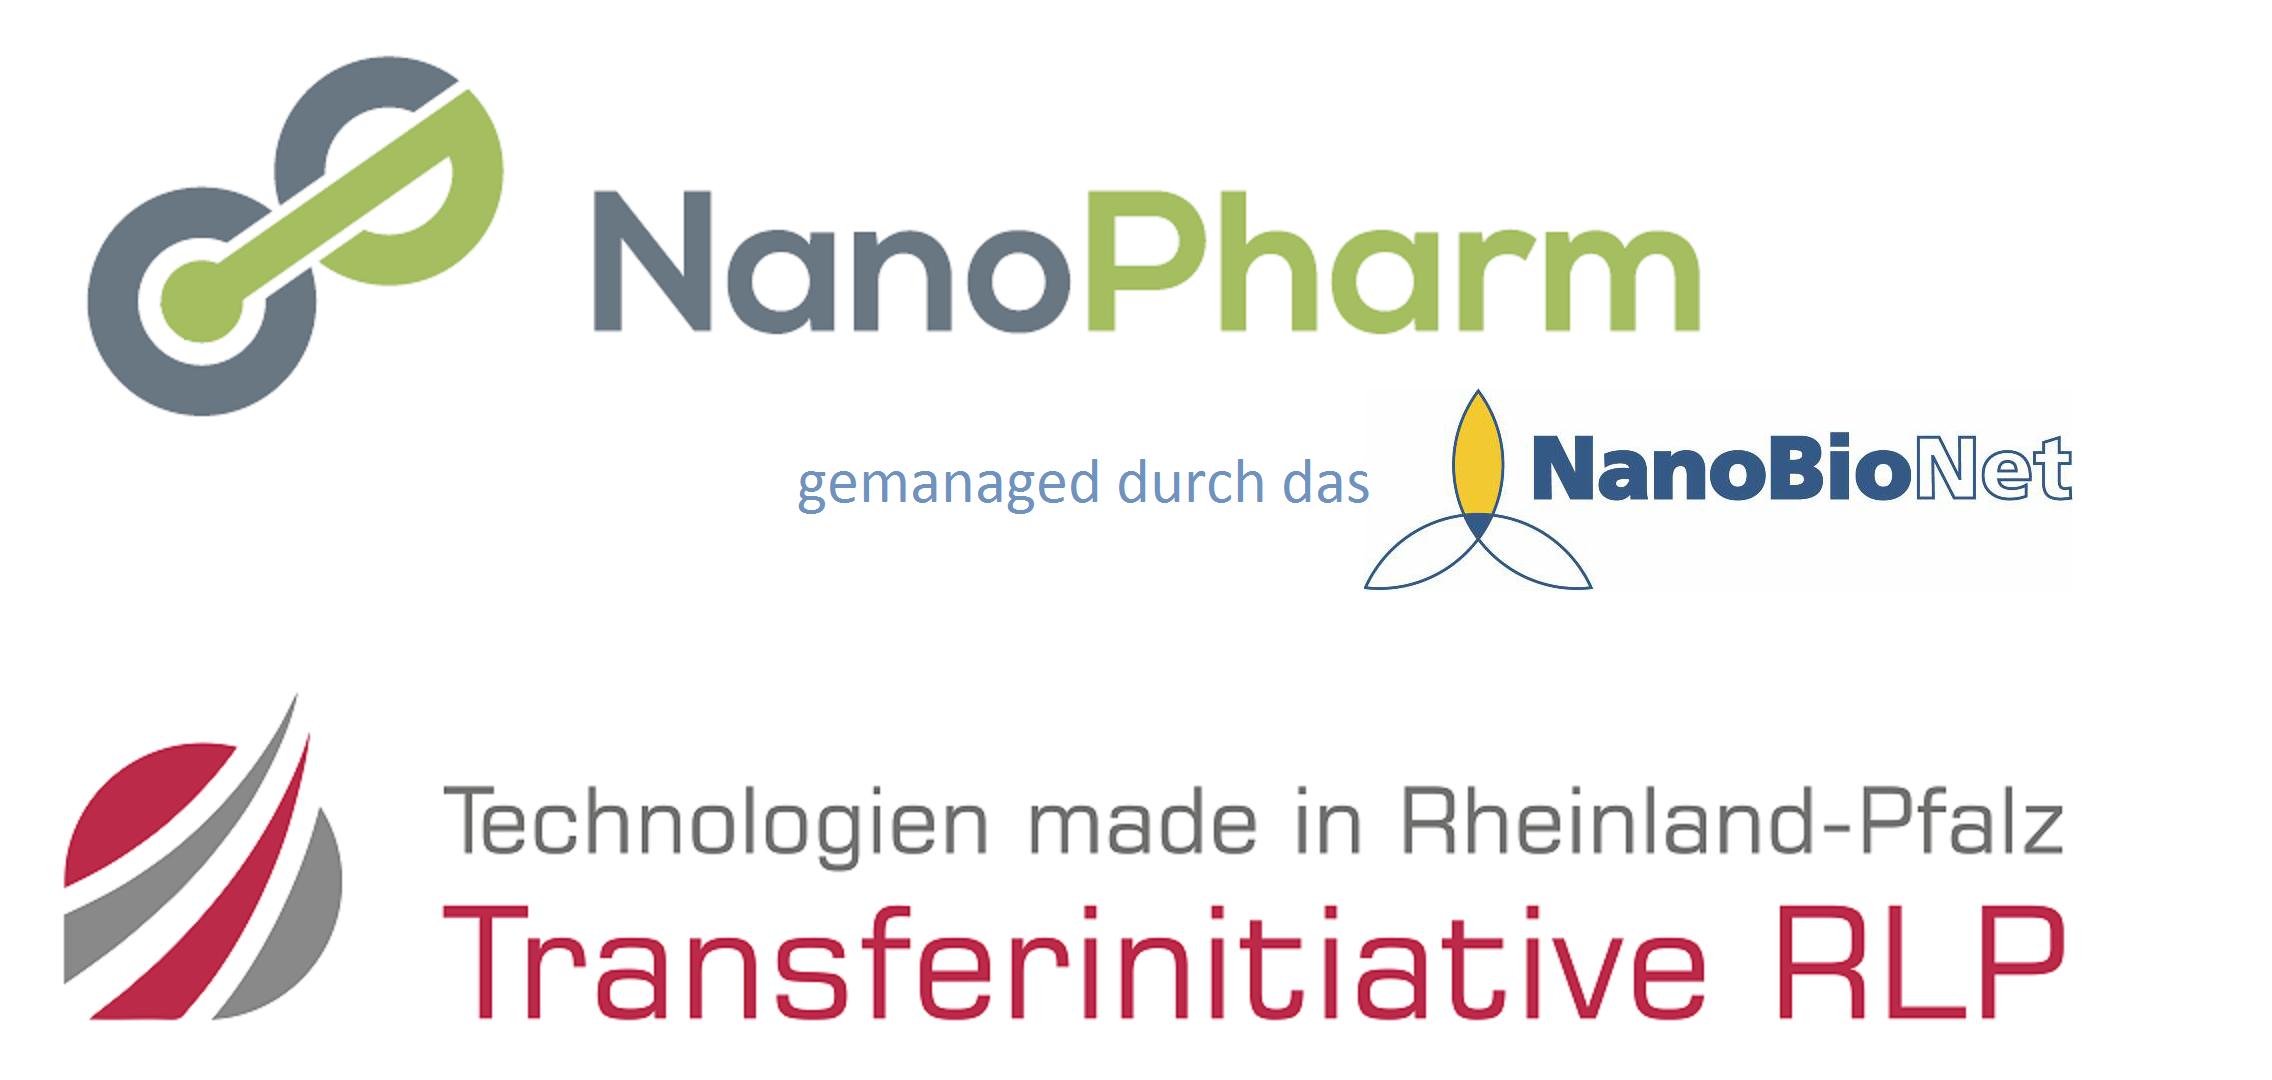 NanoPharm Meeting